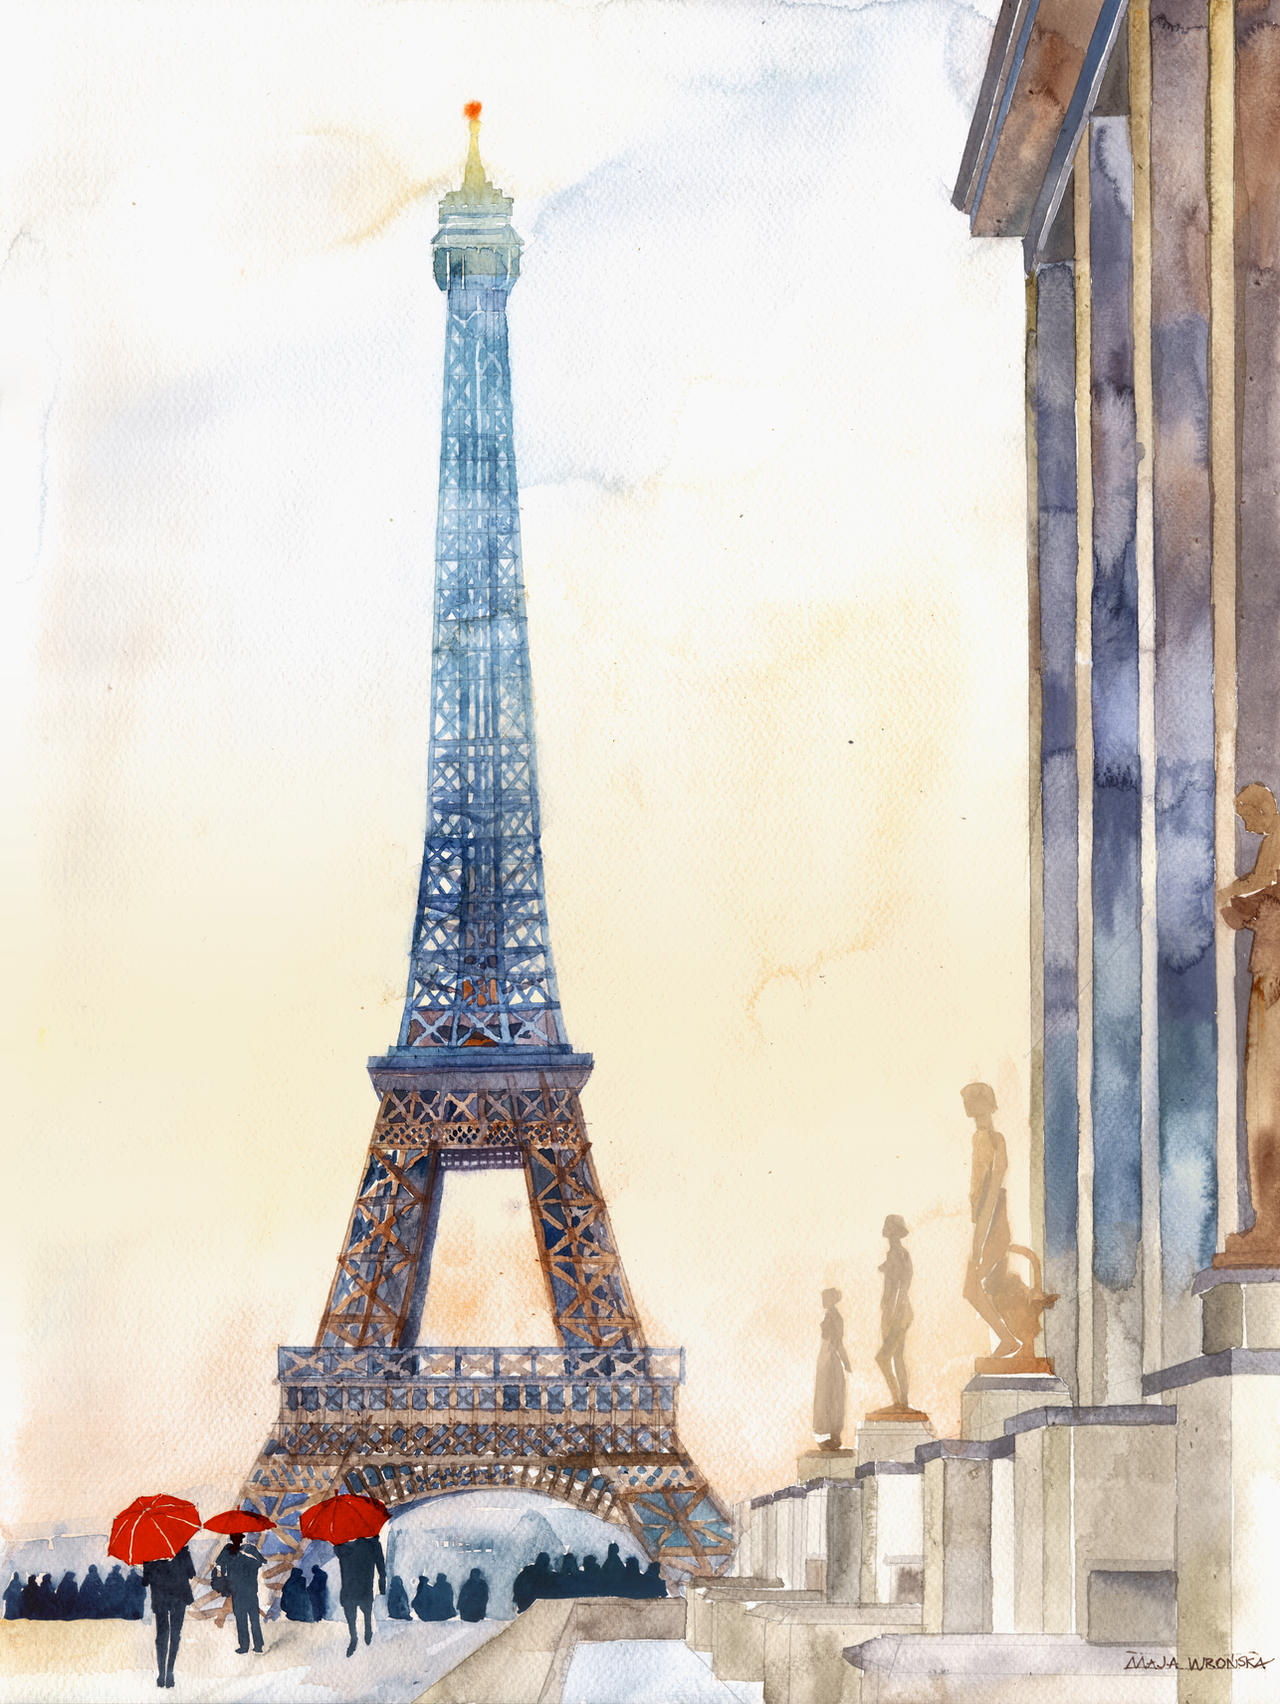 Morning in Paris by takmaj